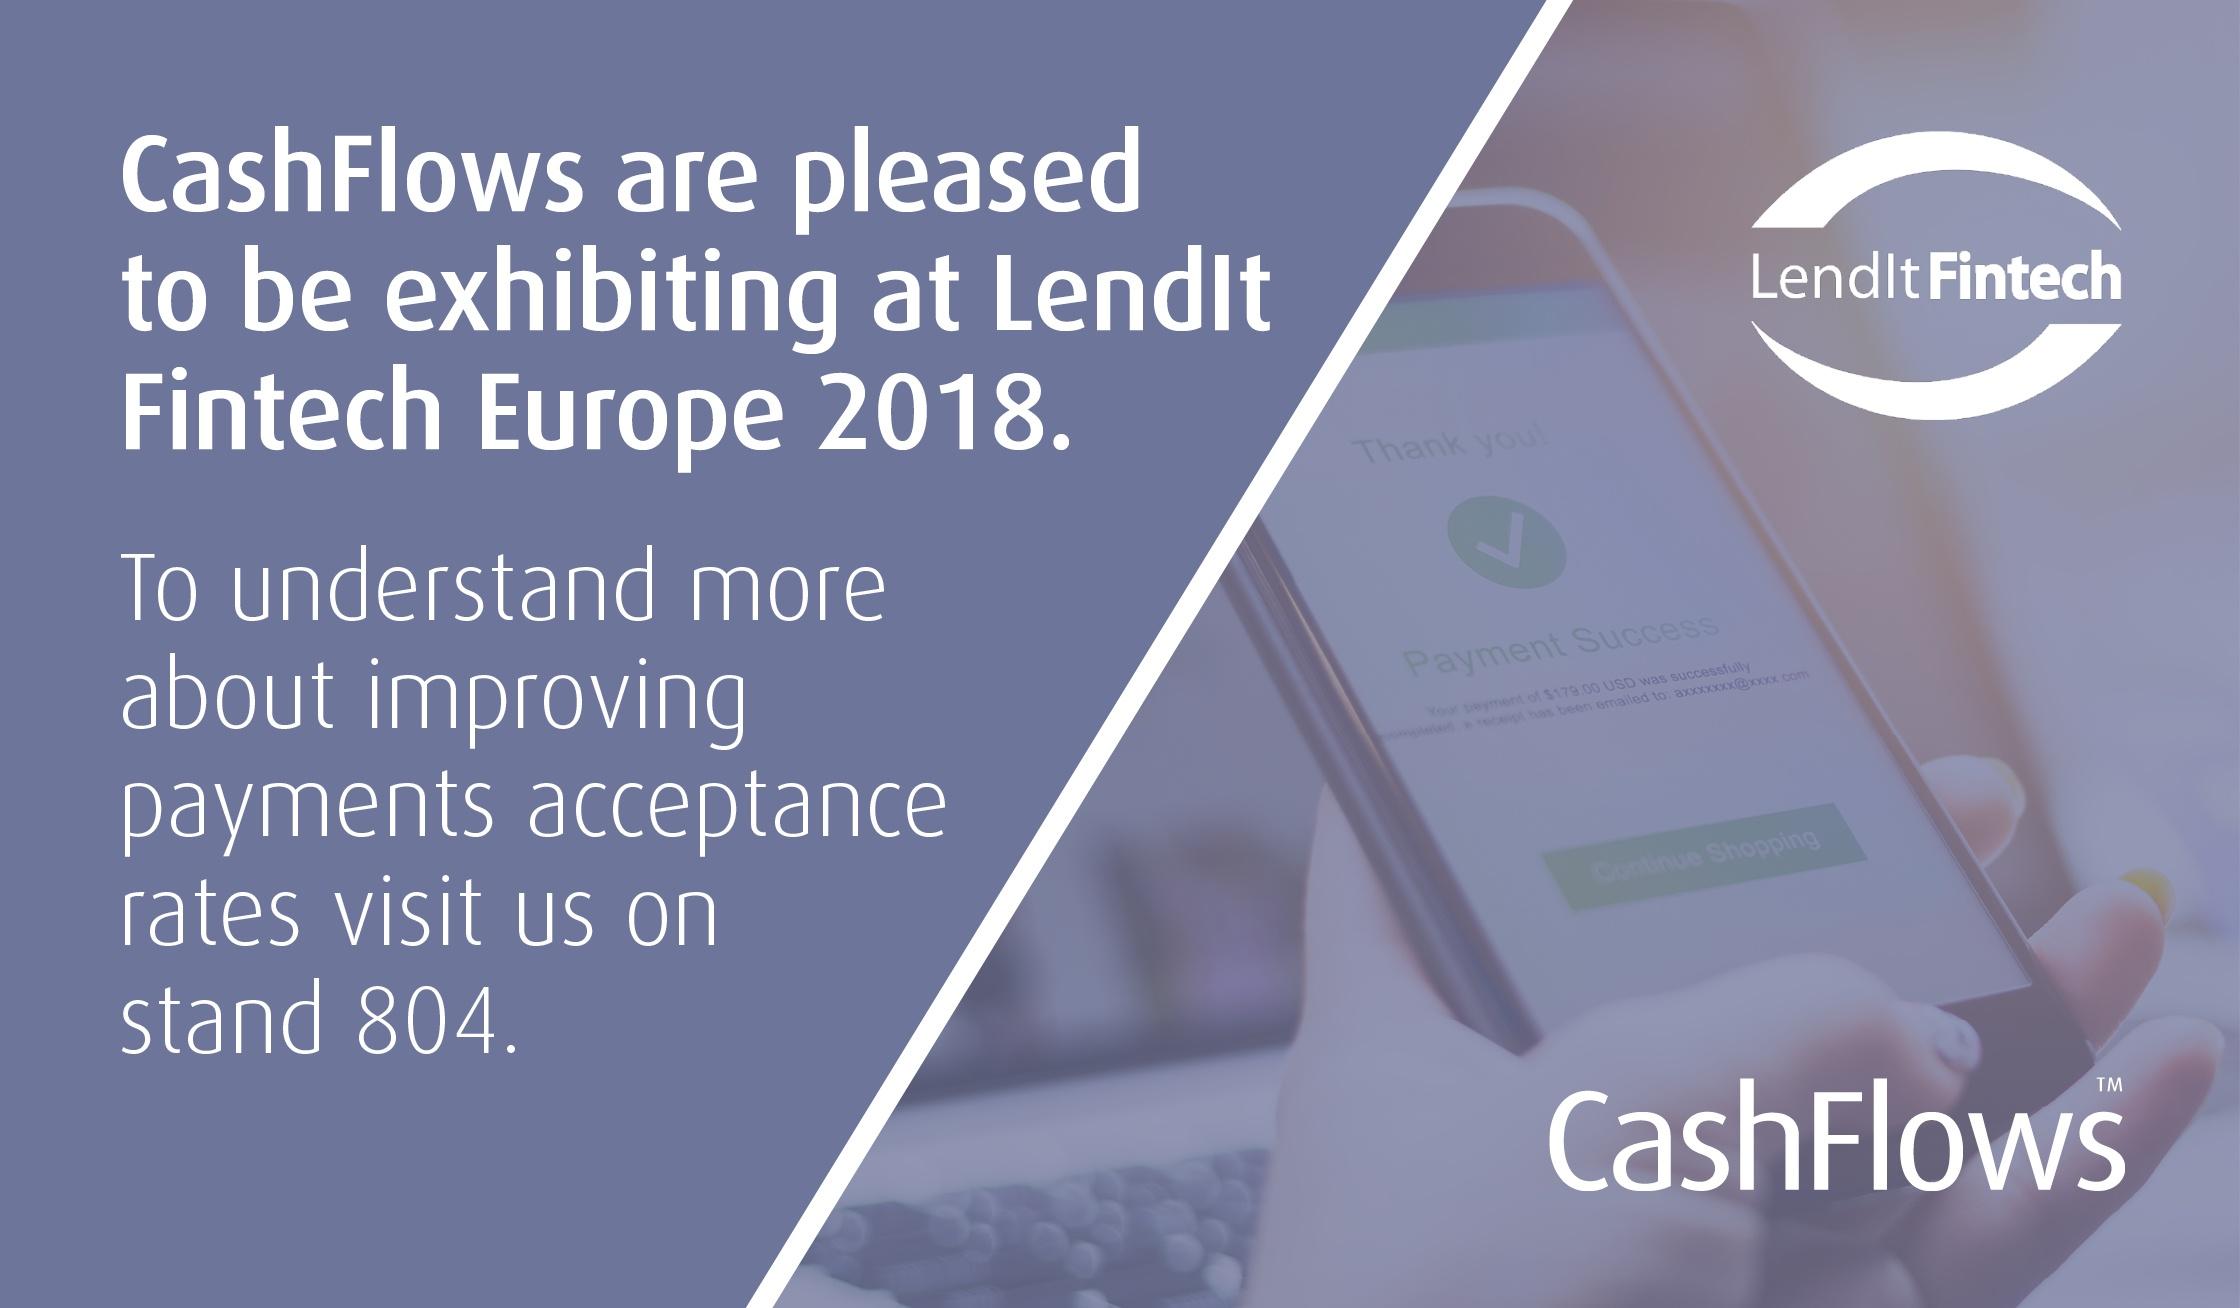 Soon to be landing at Lendit Fintech Europe 2018